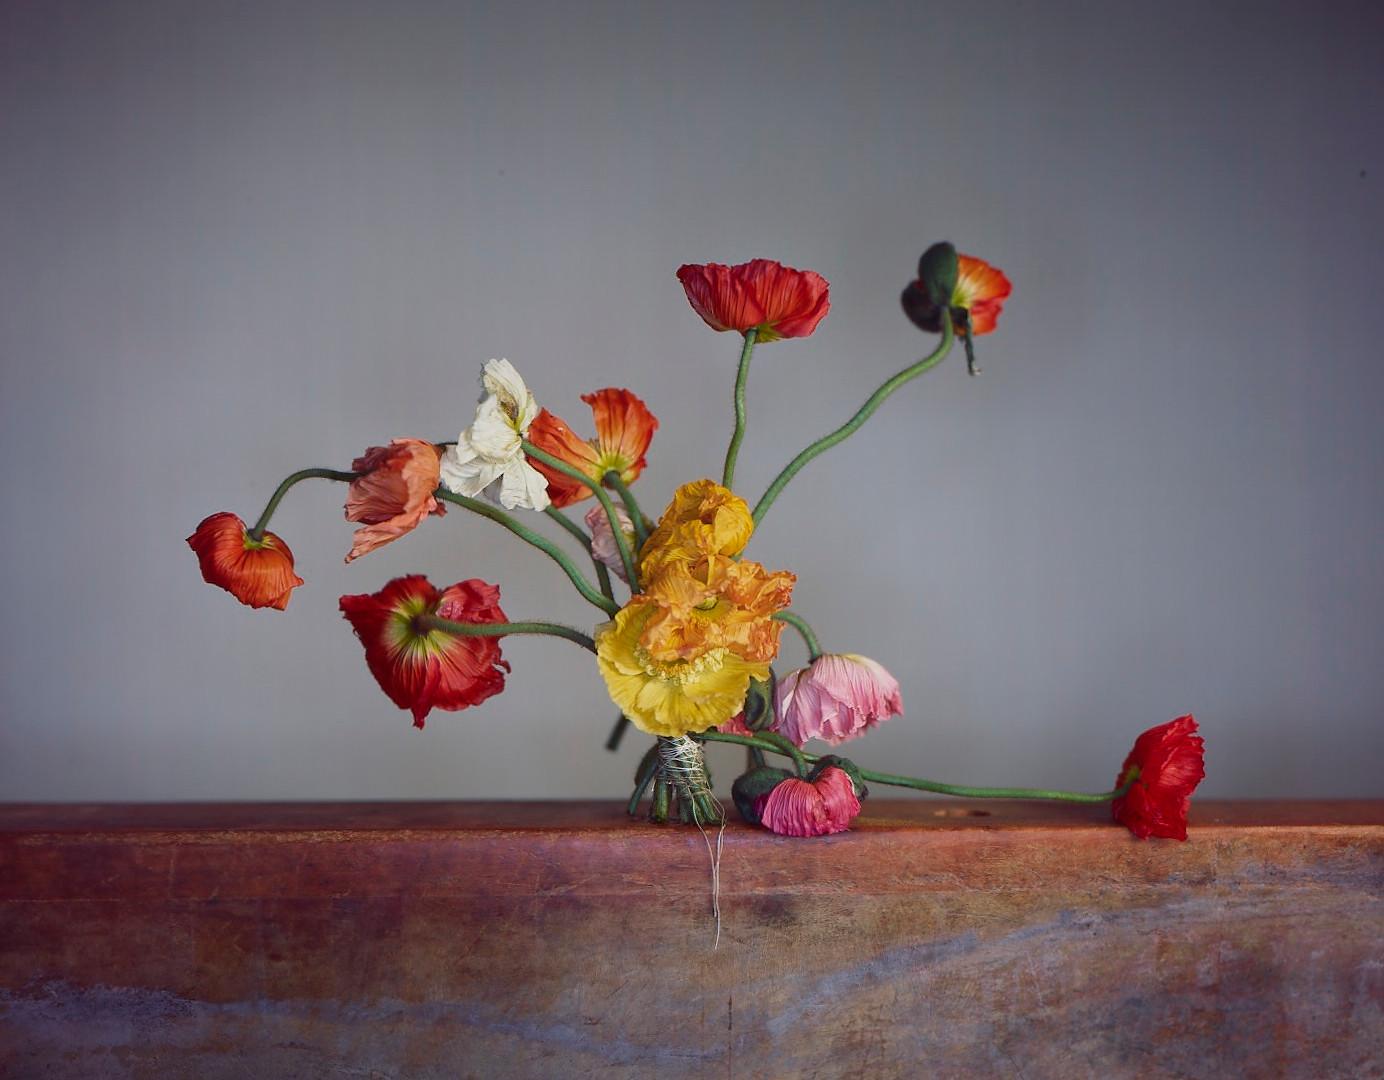 Richard Learoyd, Full Bloom Poppies (Eccentric), 2018